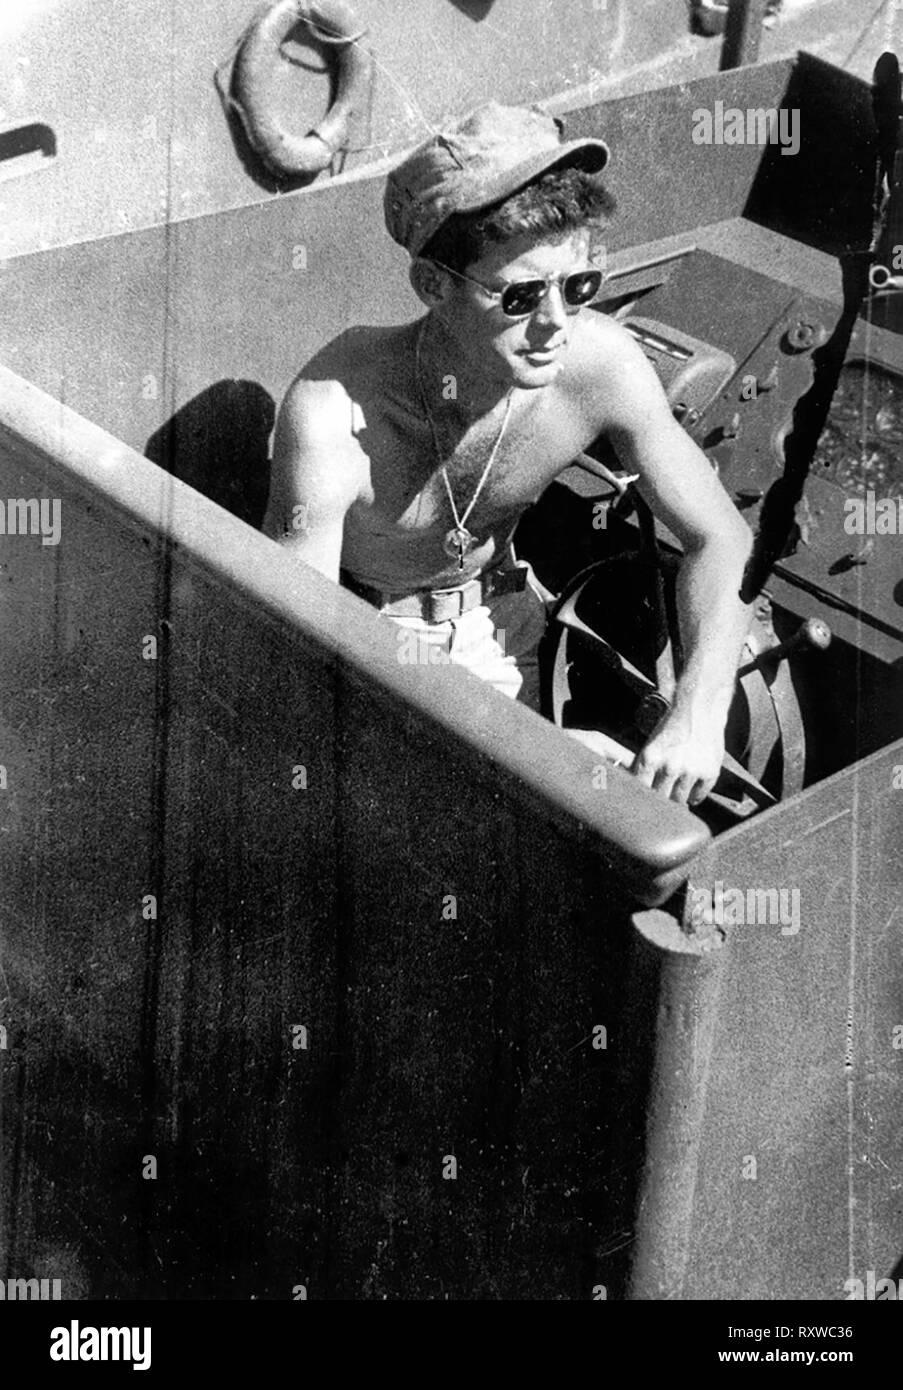 Lt. John F. Kennedy aboard the PT-109, 1943 - Stock Image